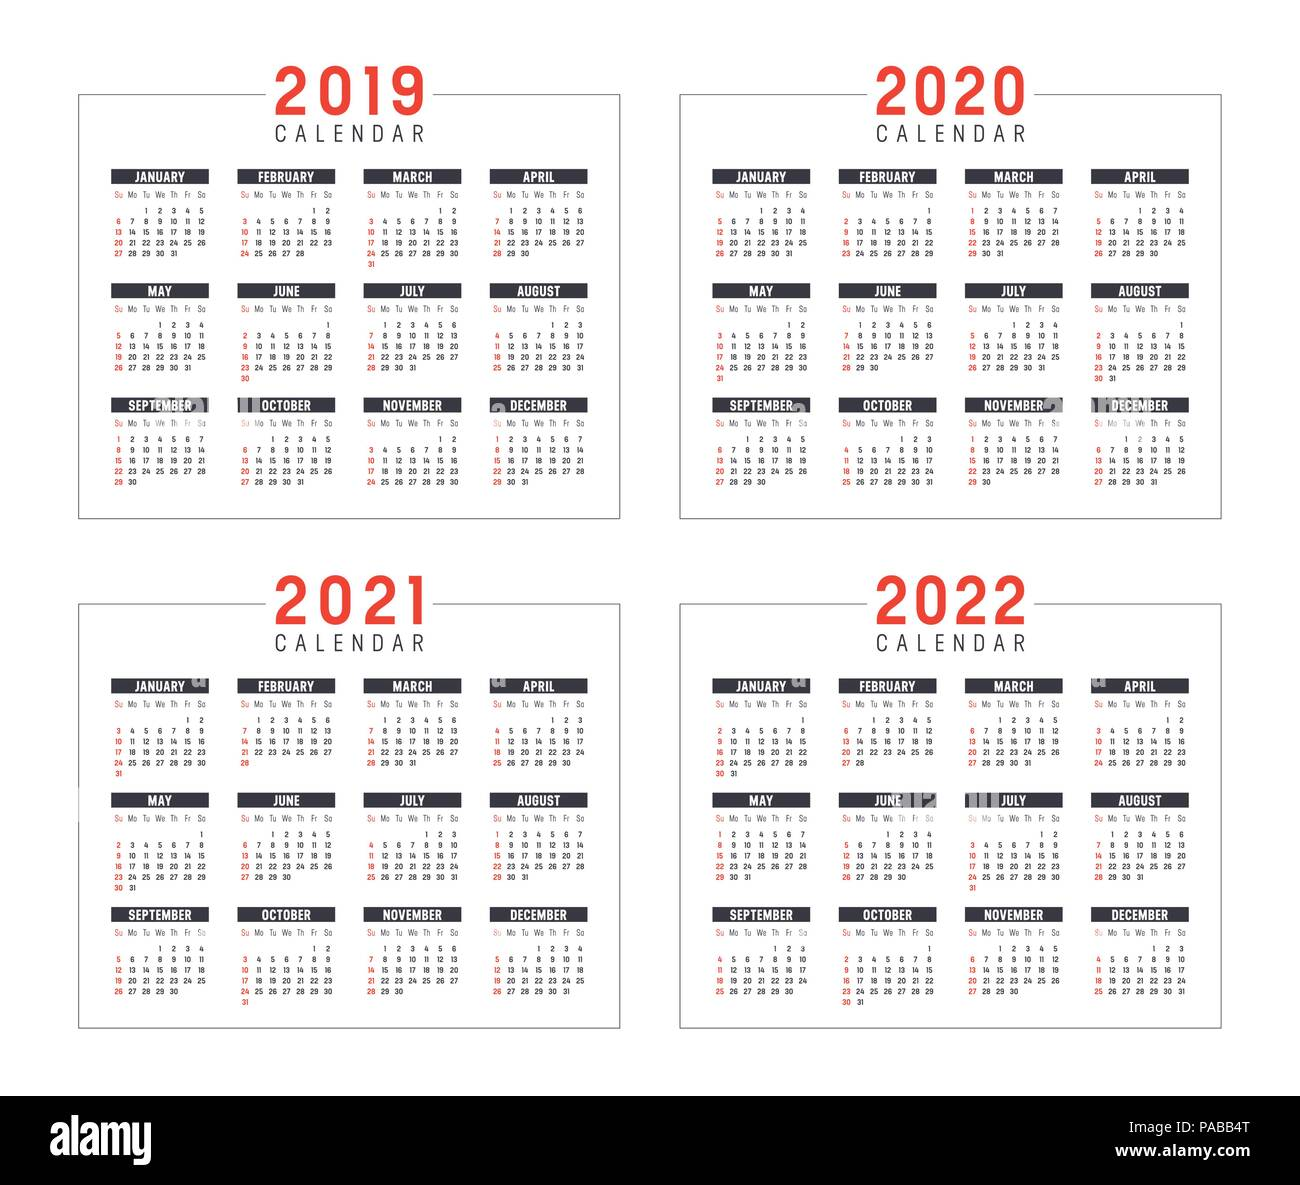 Calendario De Semanas.Conjunto De Calendarios Minimalista Anos 2019 2020 2021 2022